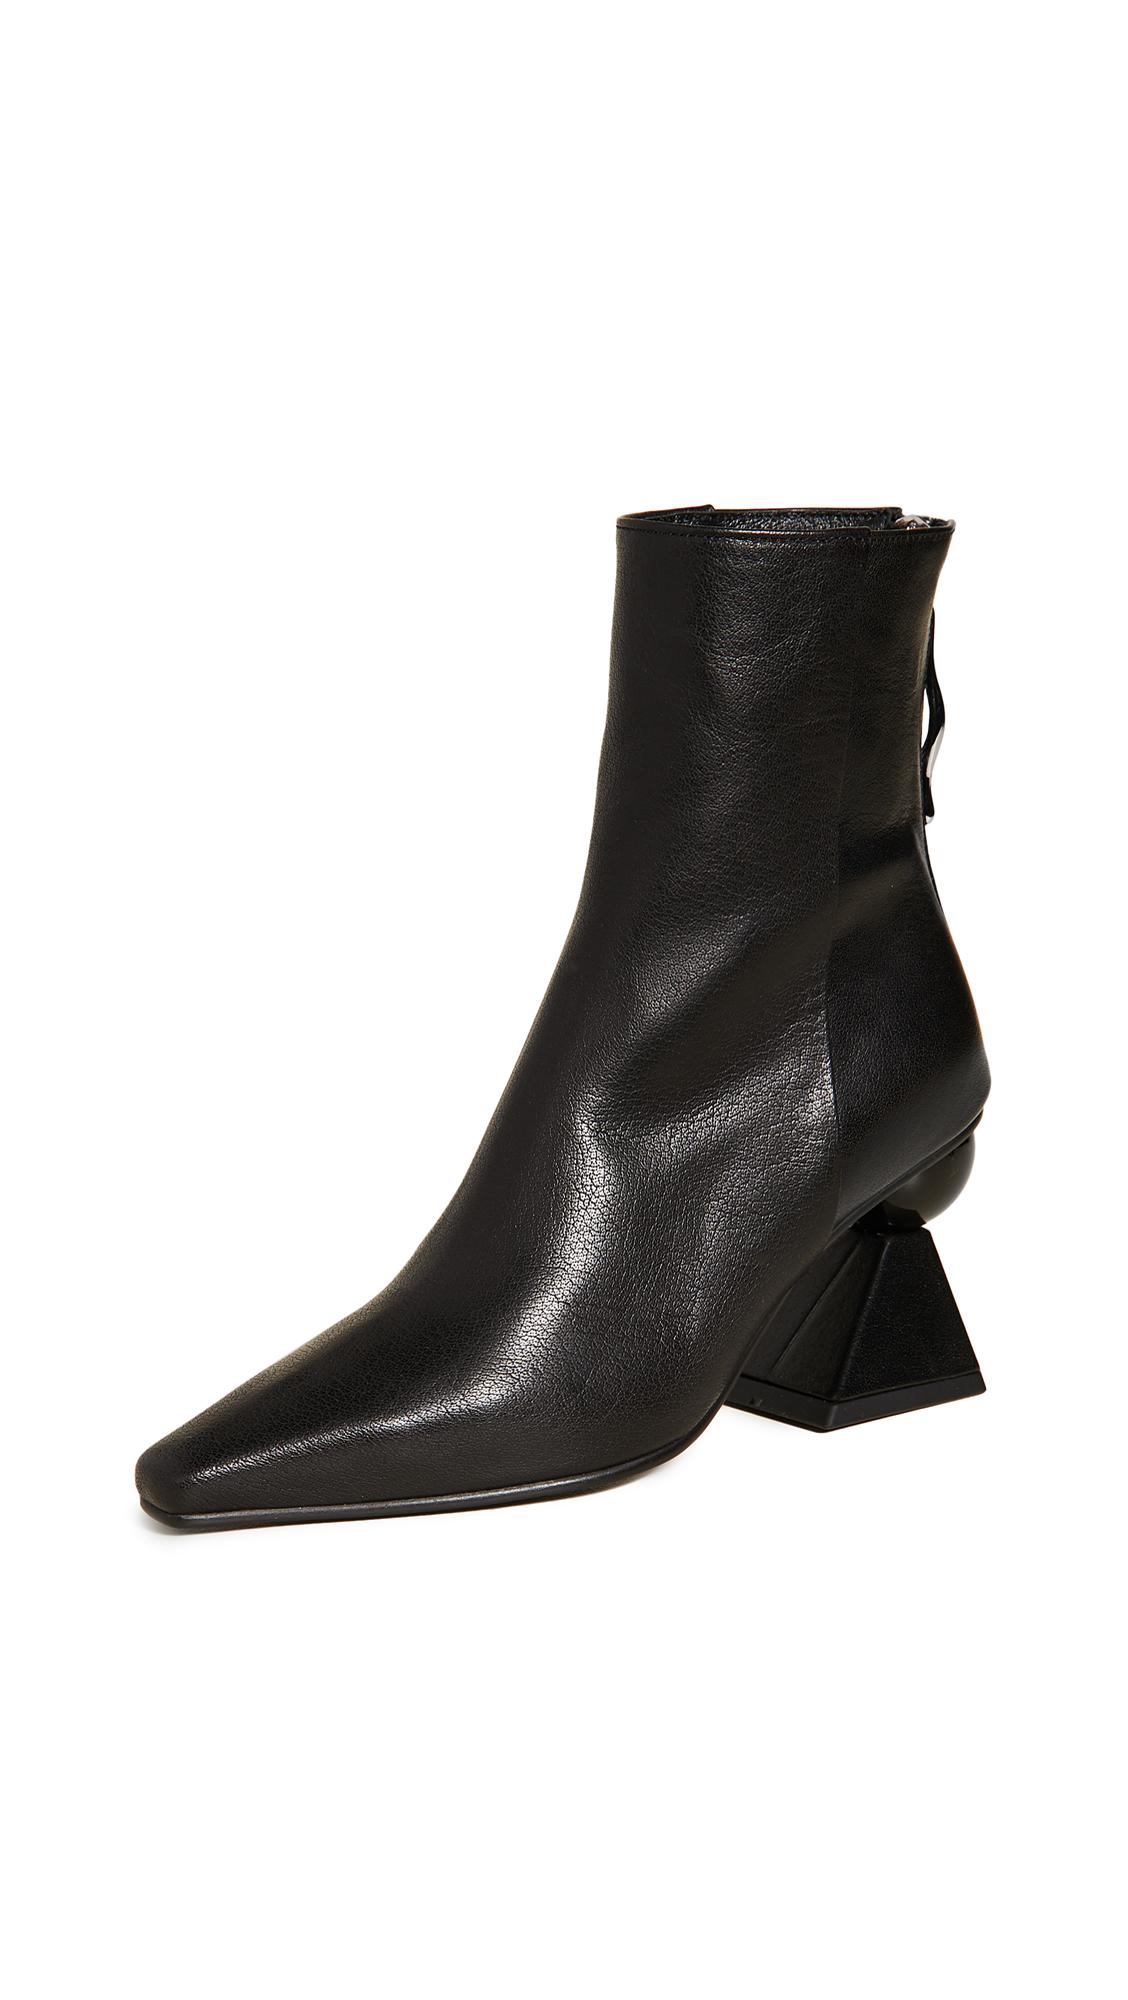 Yuul Yie Boots AMOEBA GLAM HEEL BOOTS